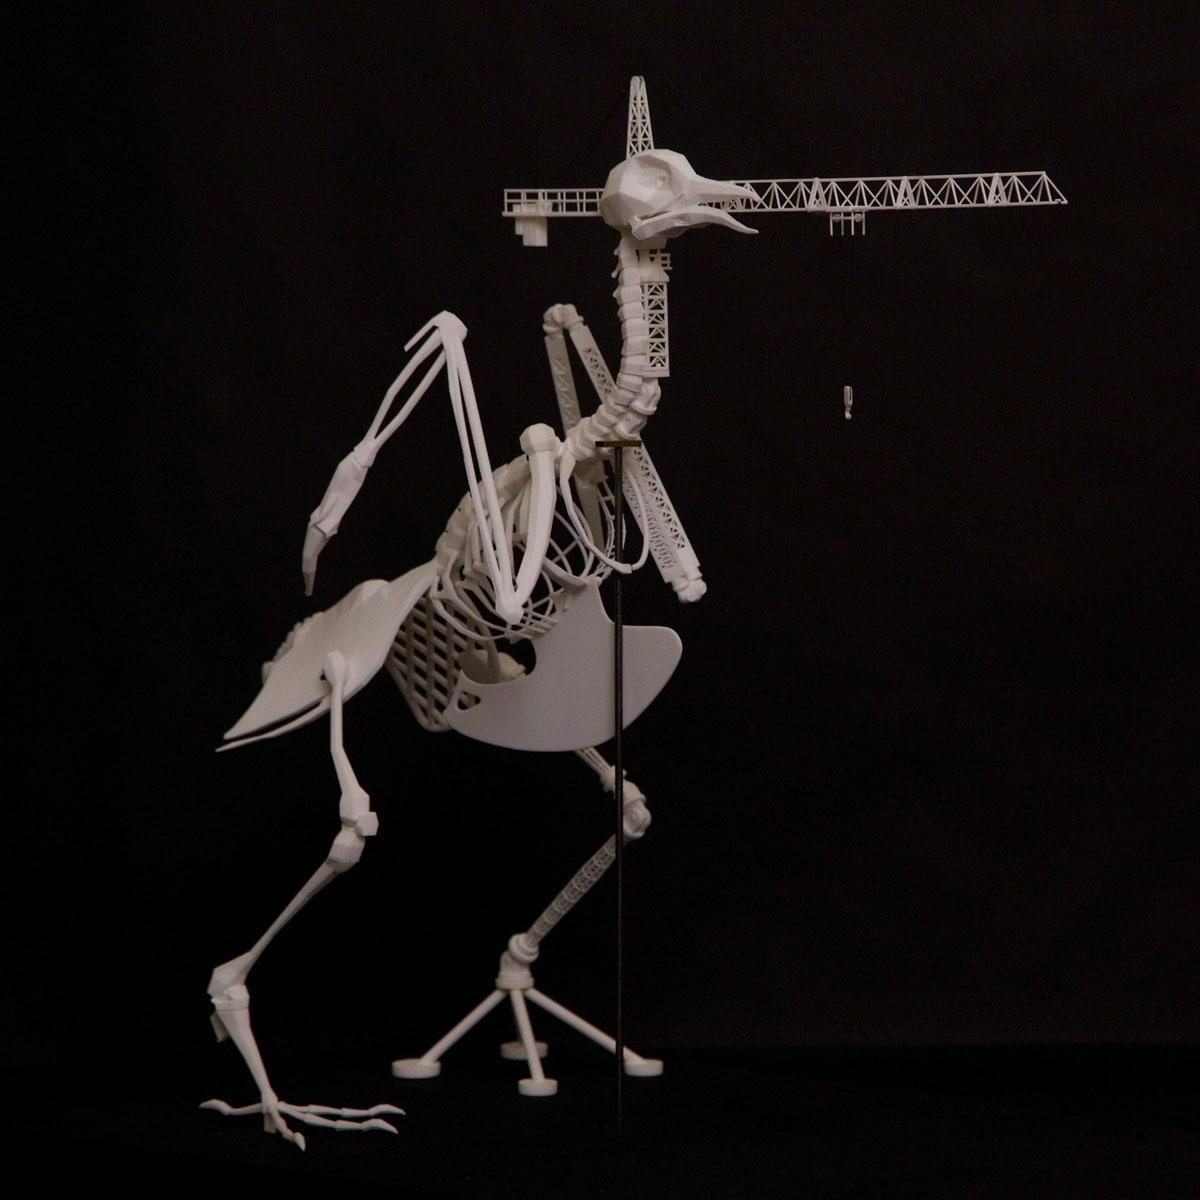 william-stanley 3D printed skeletecture-sculpture